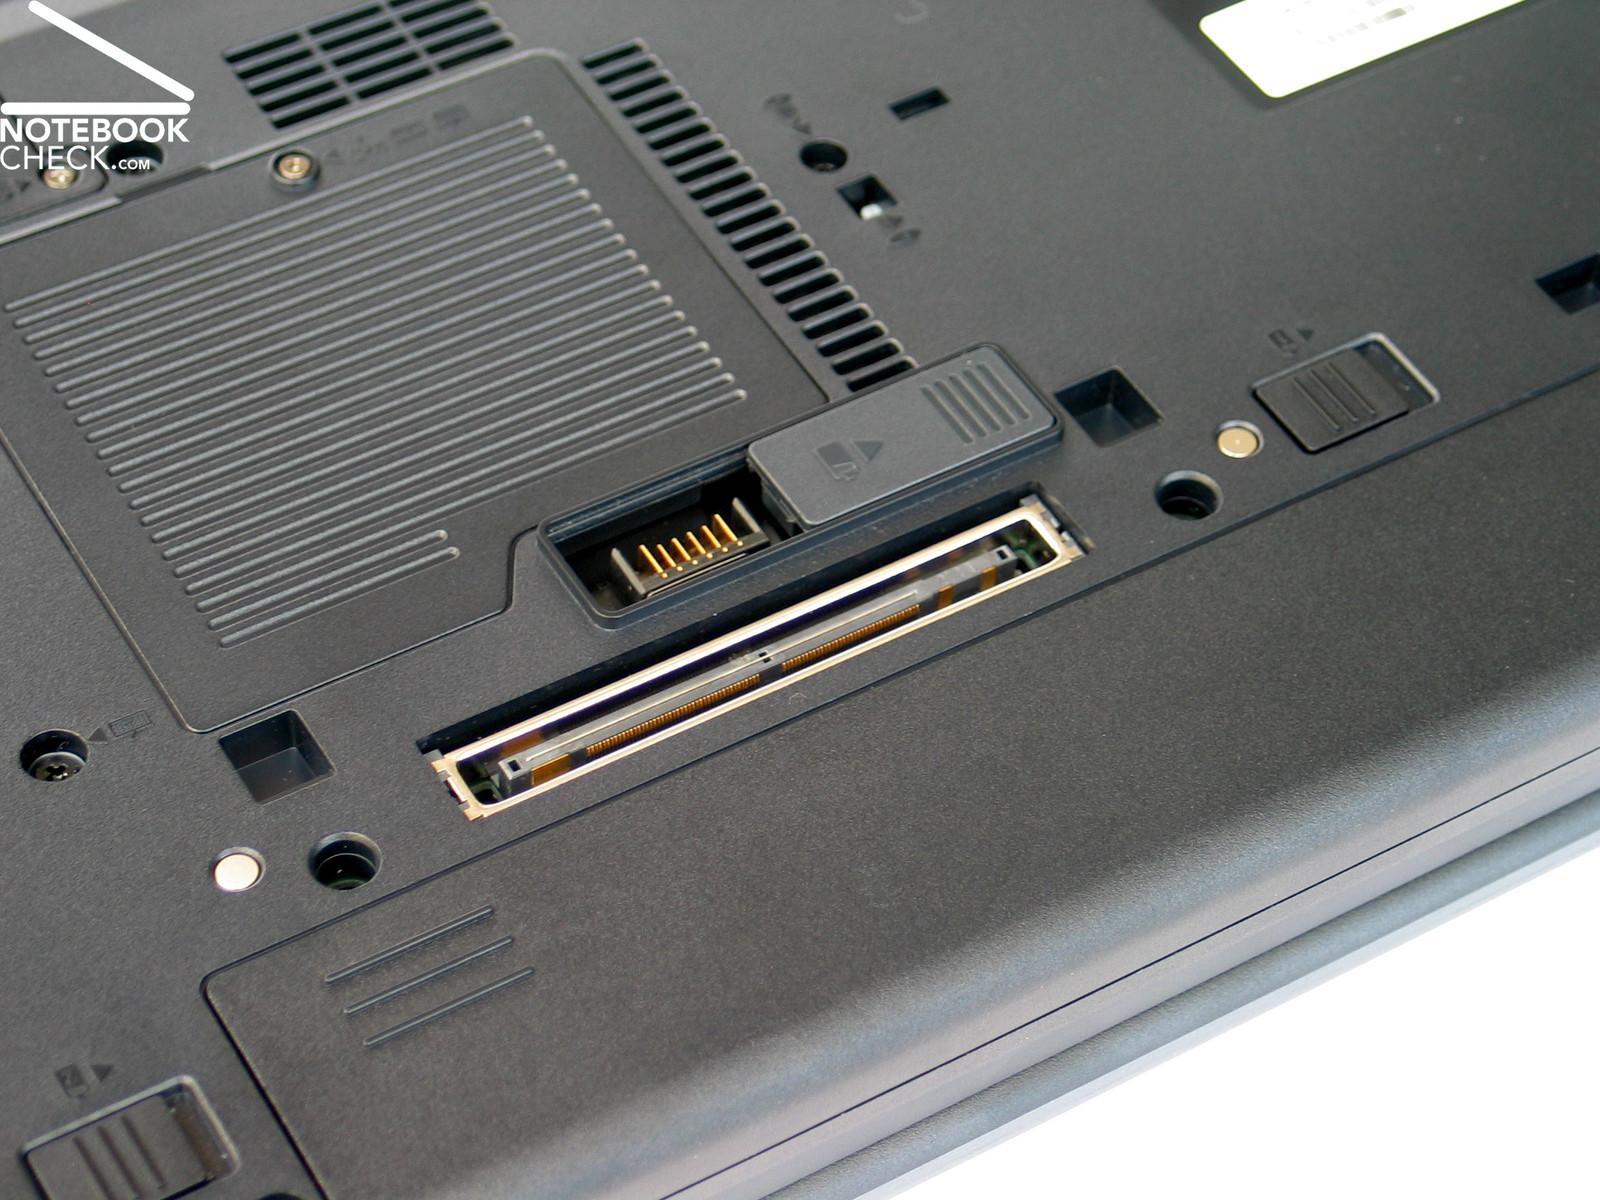 Review Hp Compaq 6710b Notebook Notebookcheck Net Reviews